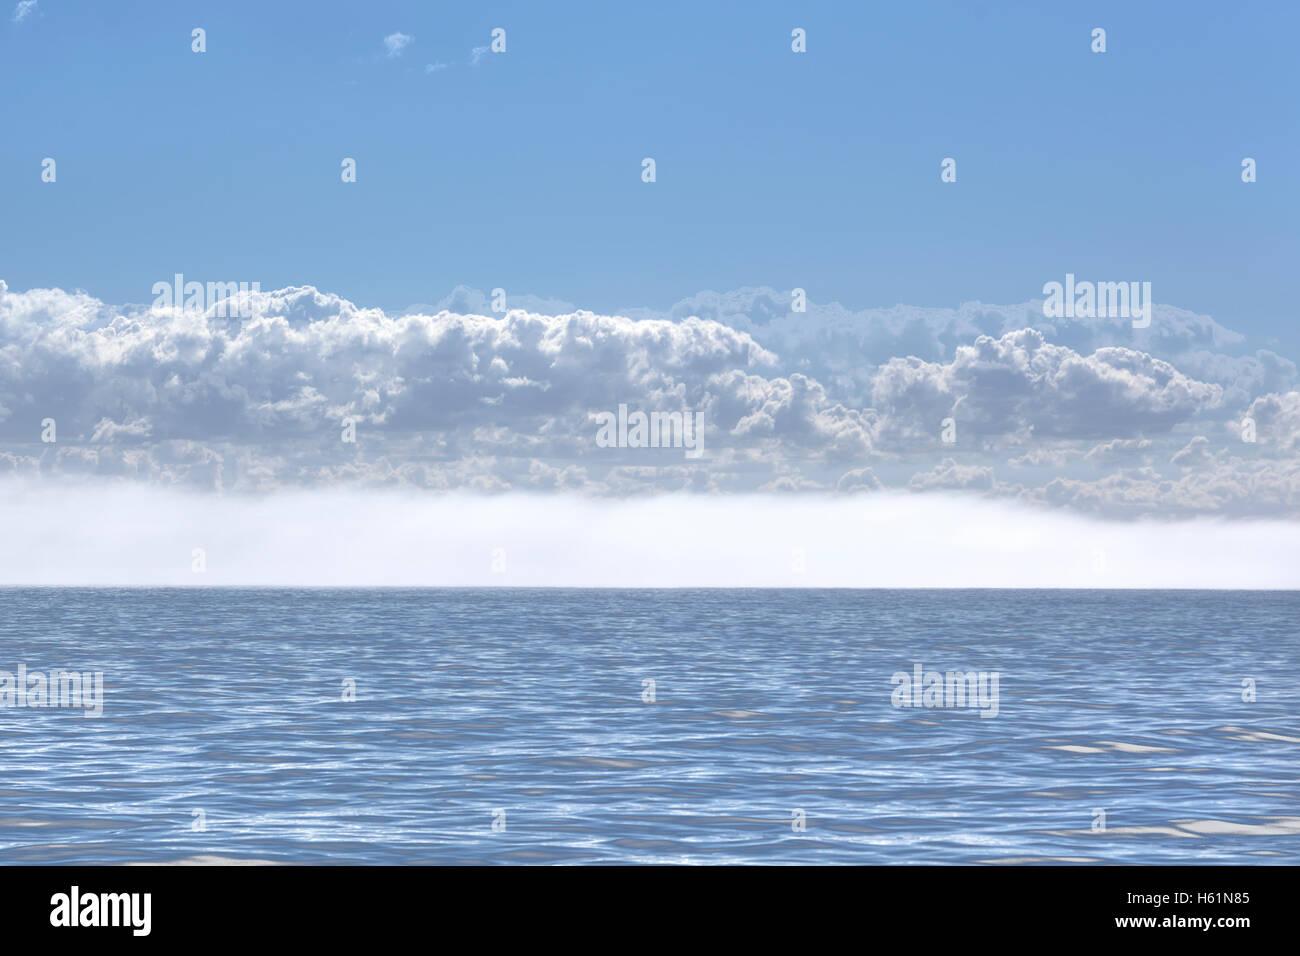 Fog on Horizon - Stock Image